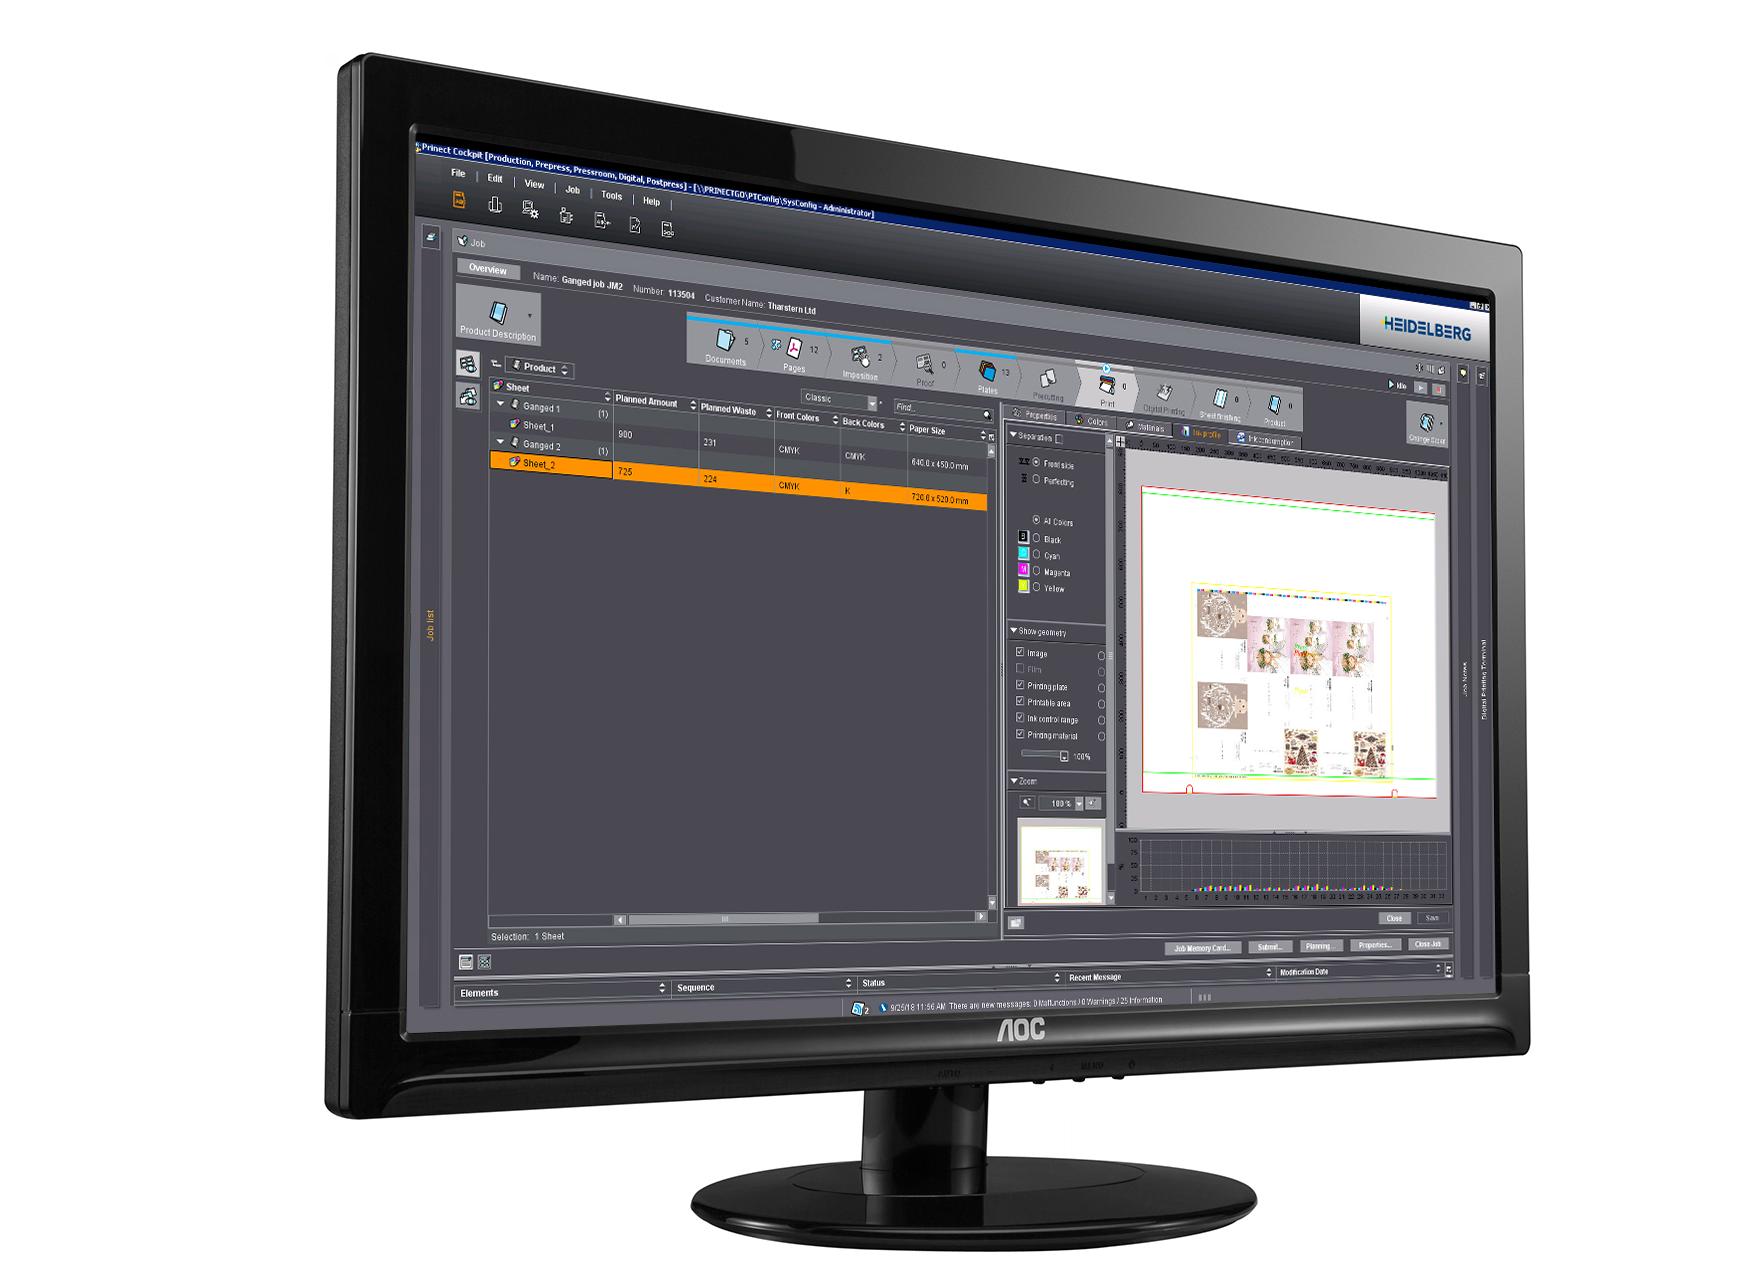 Tharstern Heidelberg Pressroom Manager Integration screenshot on computer screen